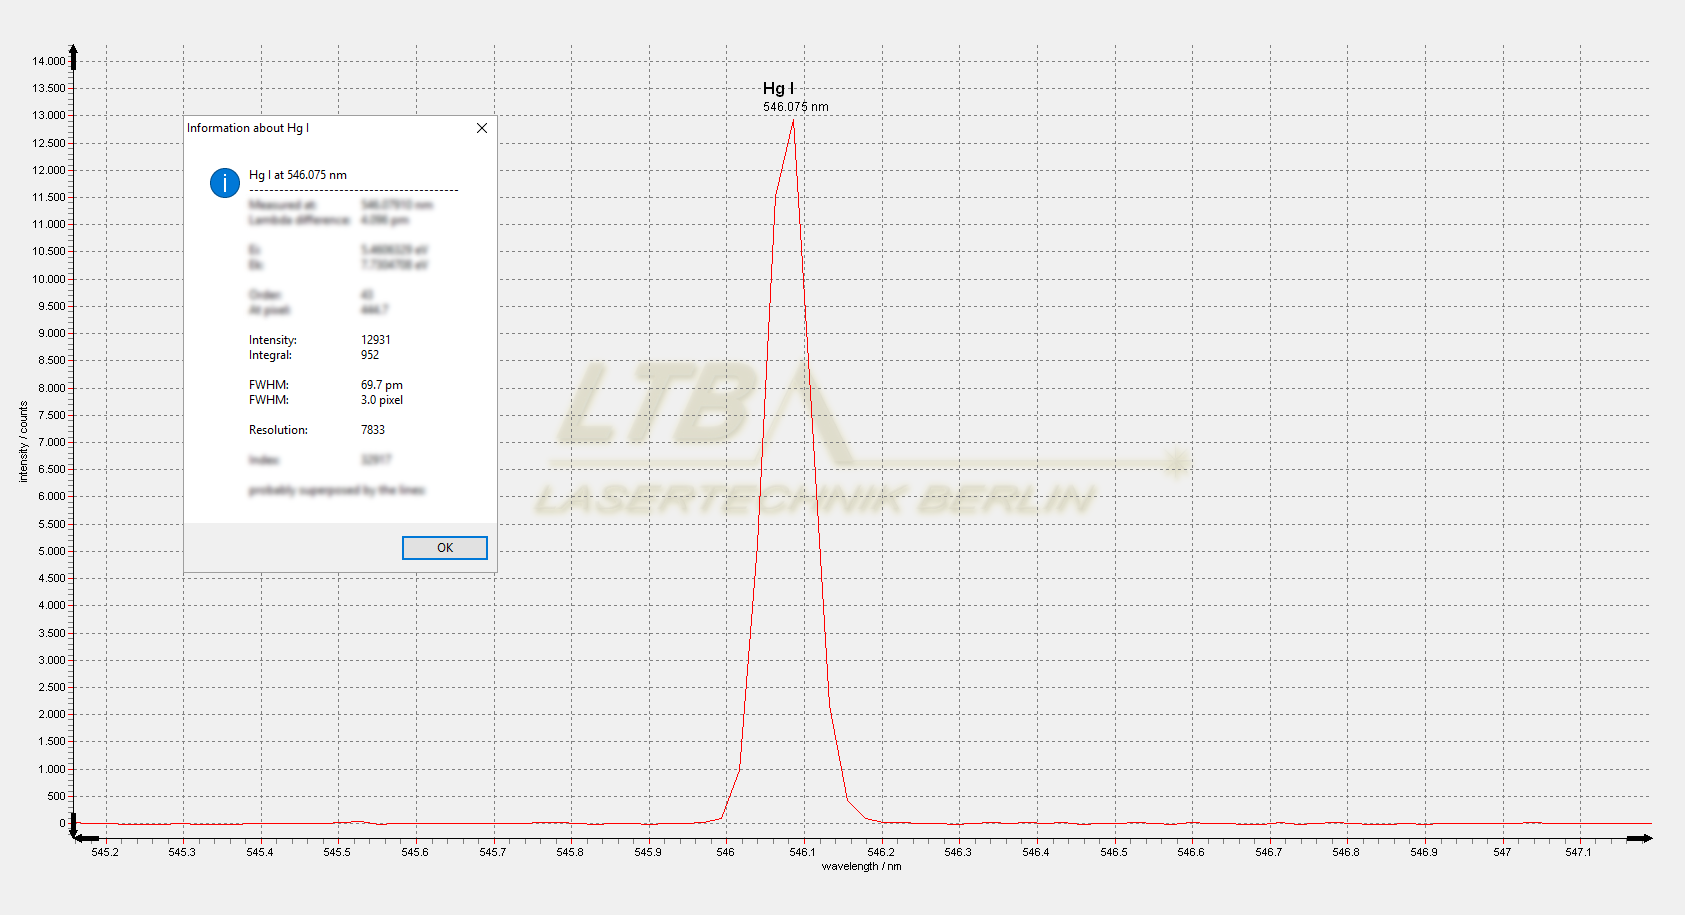 ARYELLE 150 spectrum Hg